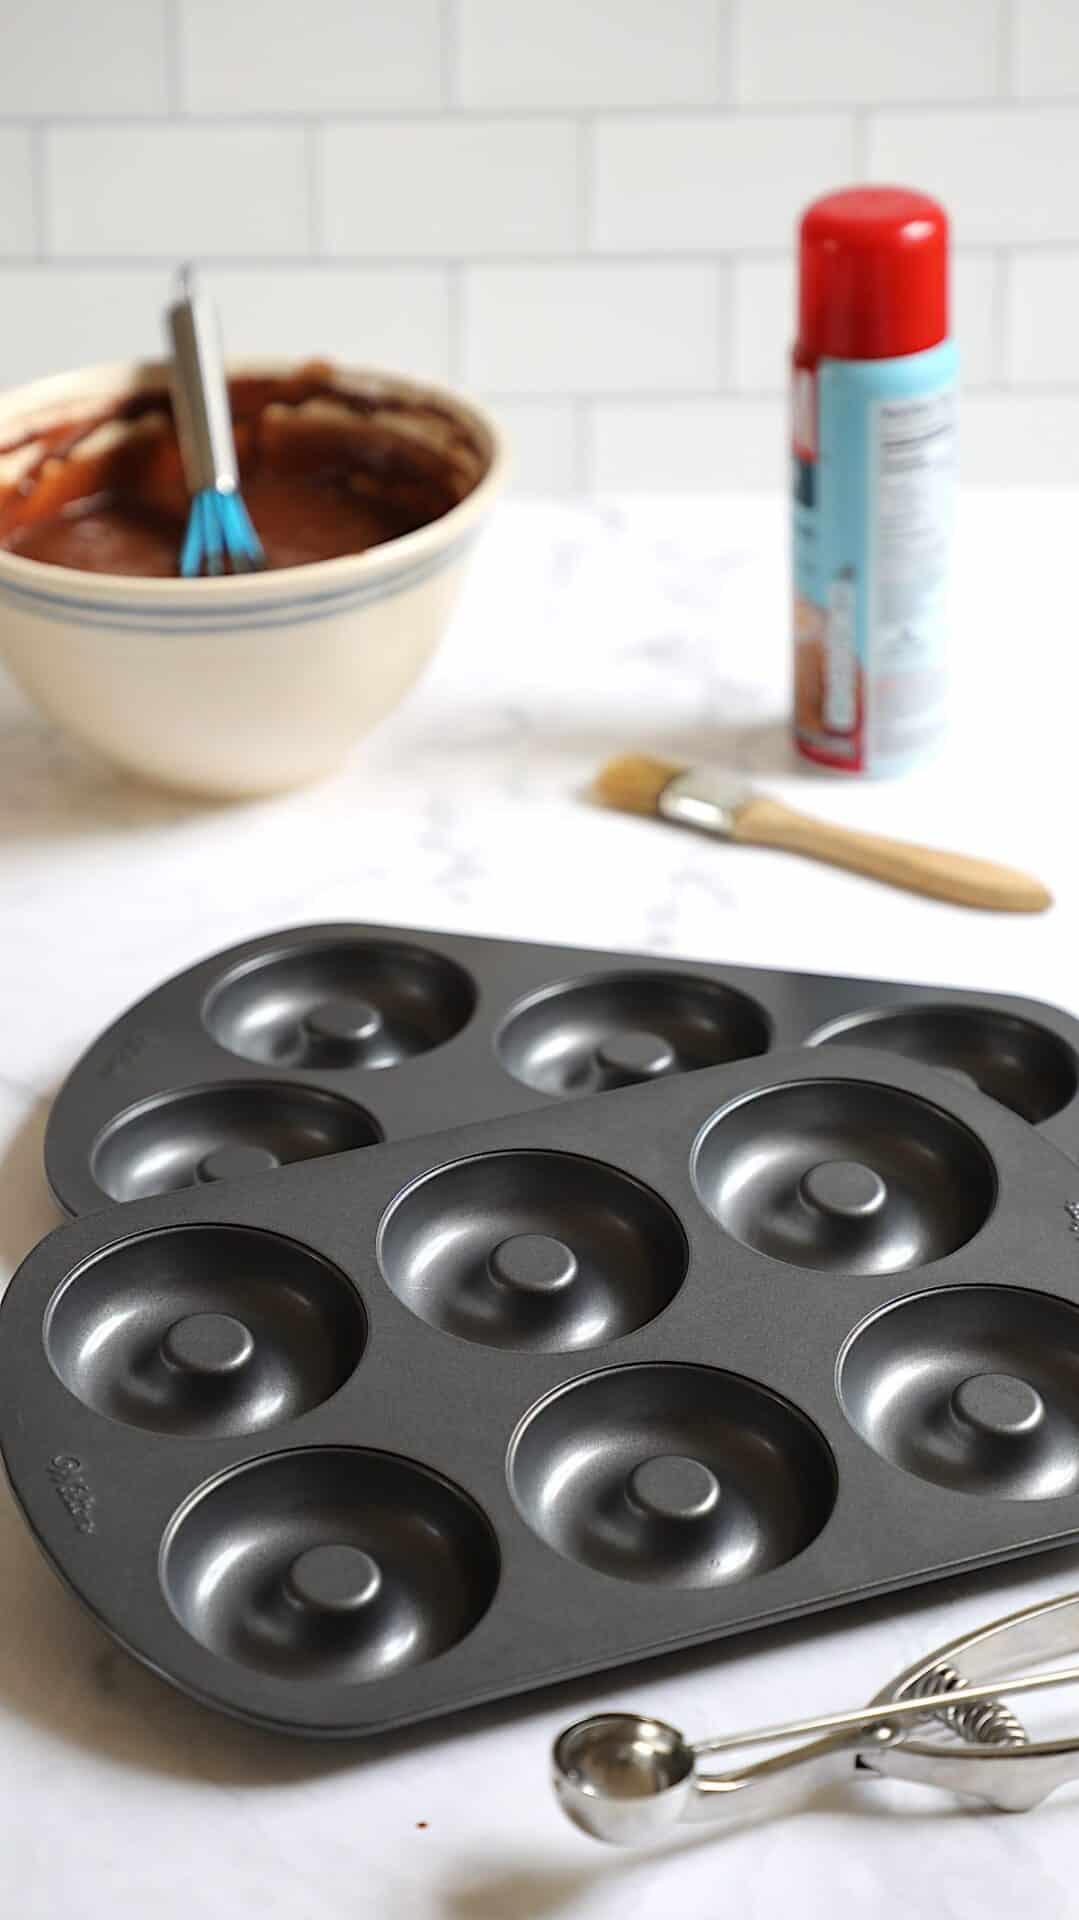 Donut Pans, baking spray and batter bowl